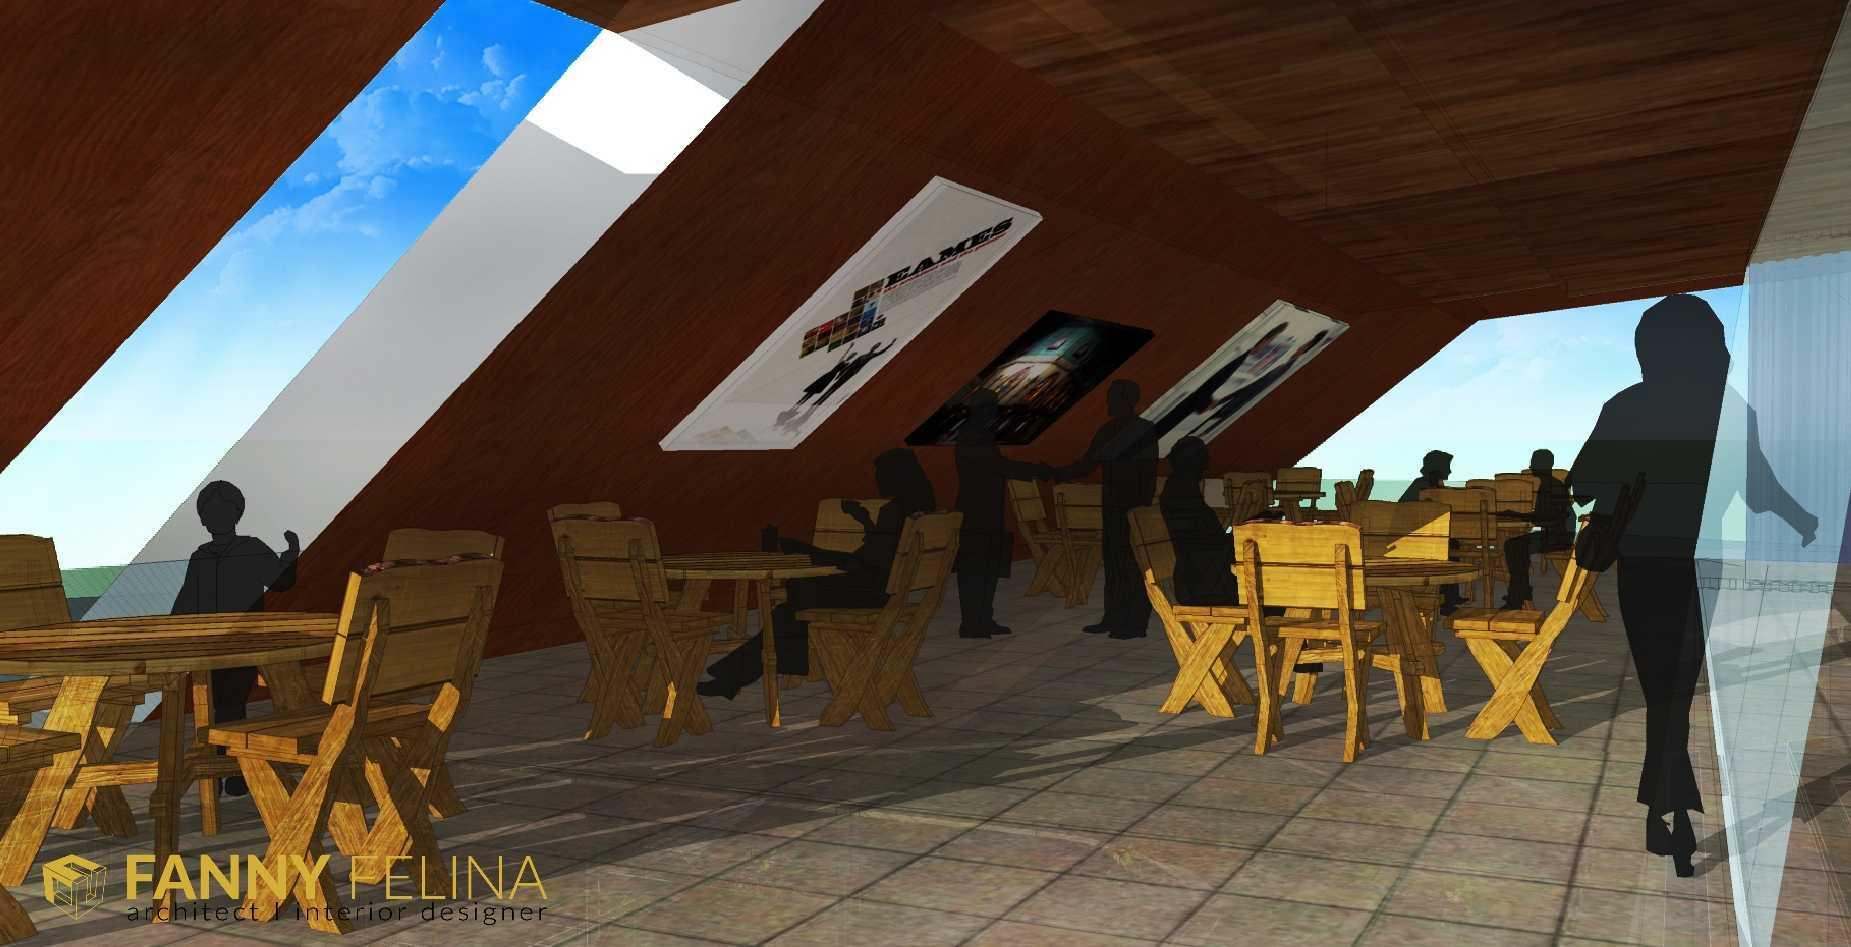 Fanny Felina Architecture & Interior Design Oasystem Office Surabaya, Surabaya City, East Java, Indonesia Surabaya, Surabaya City, East Java, Indonesia 08 Kontemporer,modern  35320